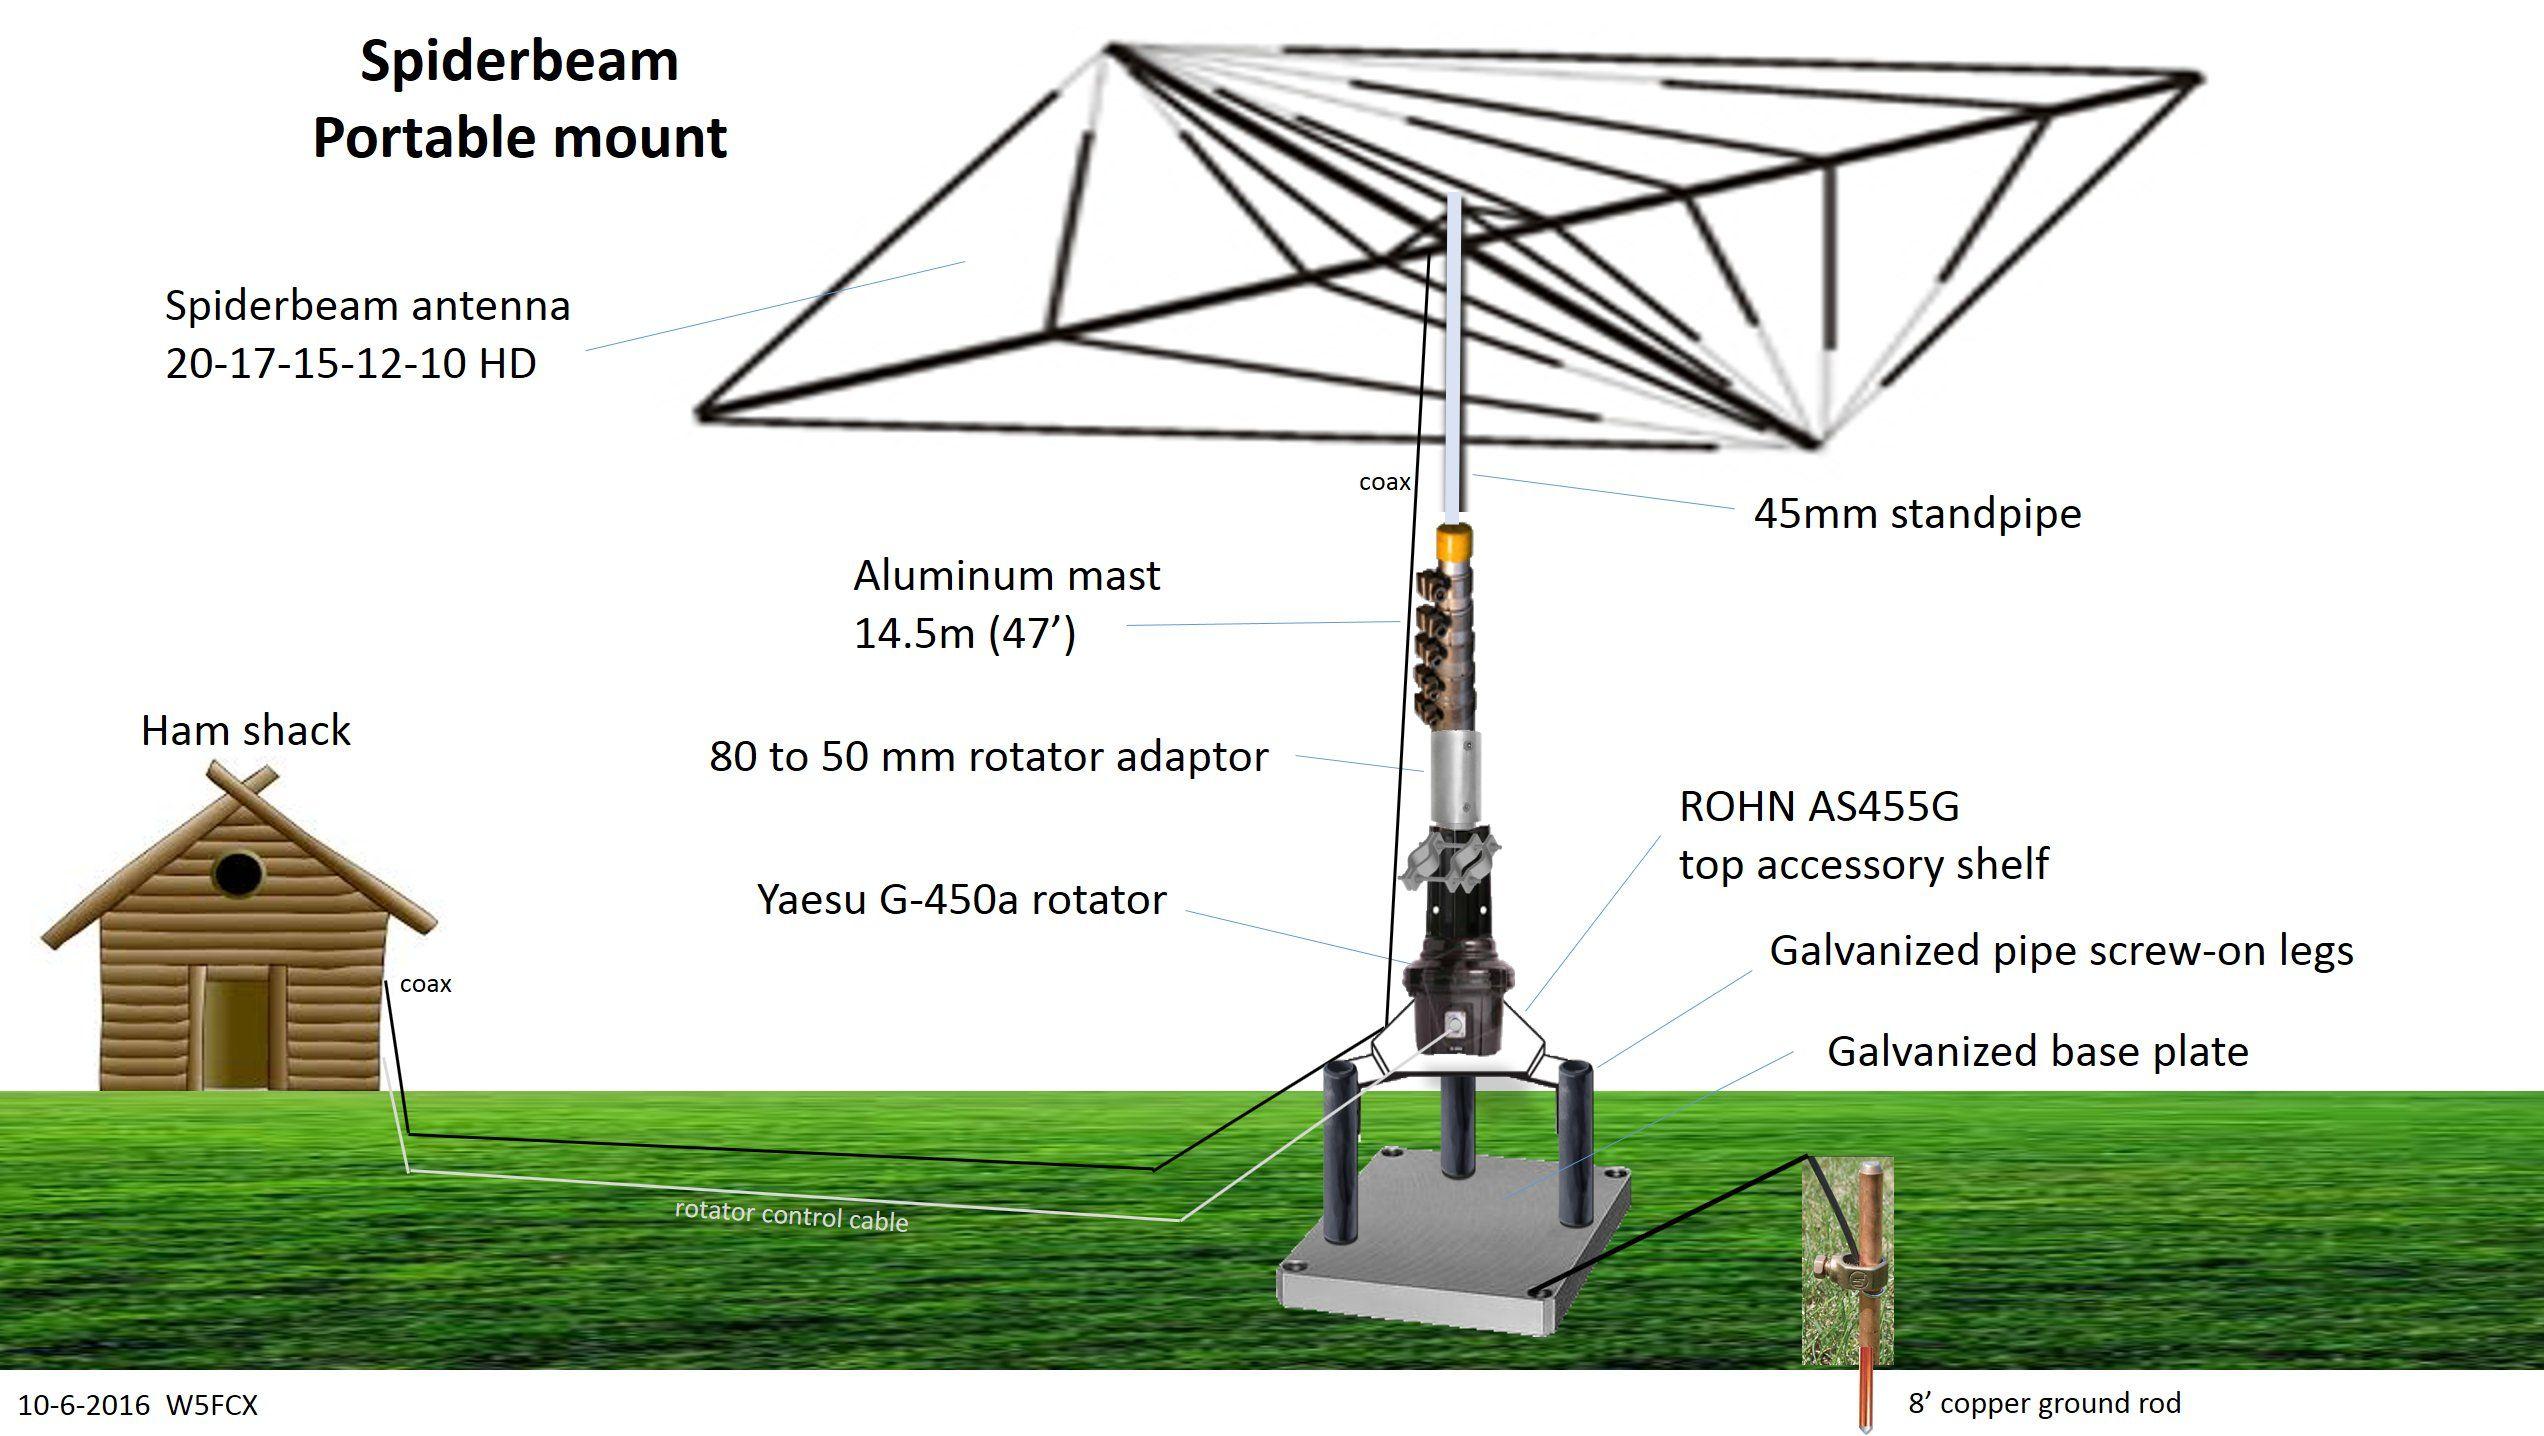 Design of a portable 50' Spiderbeam yagi antenna made of